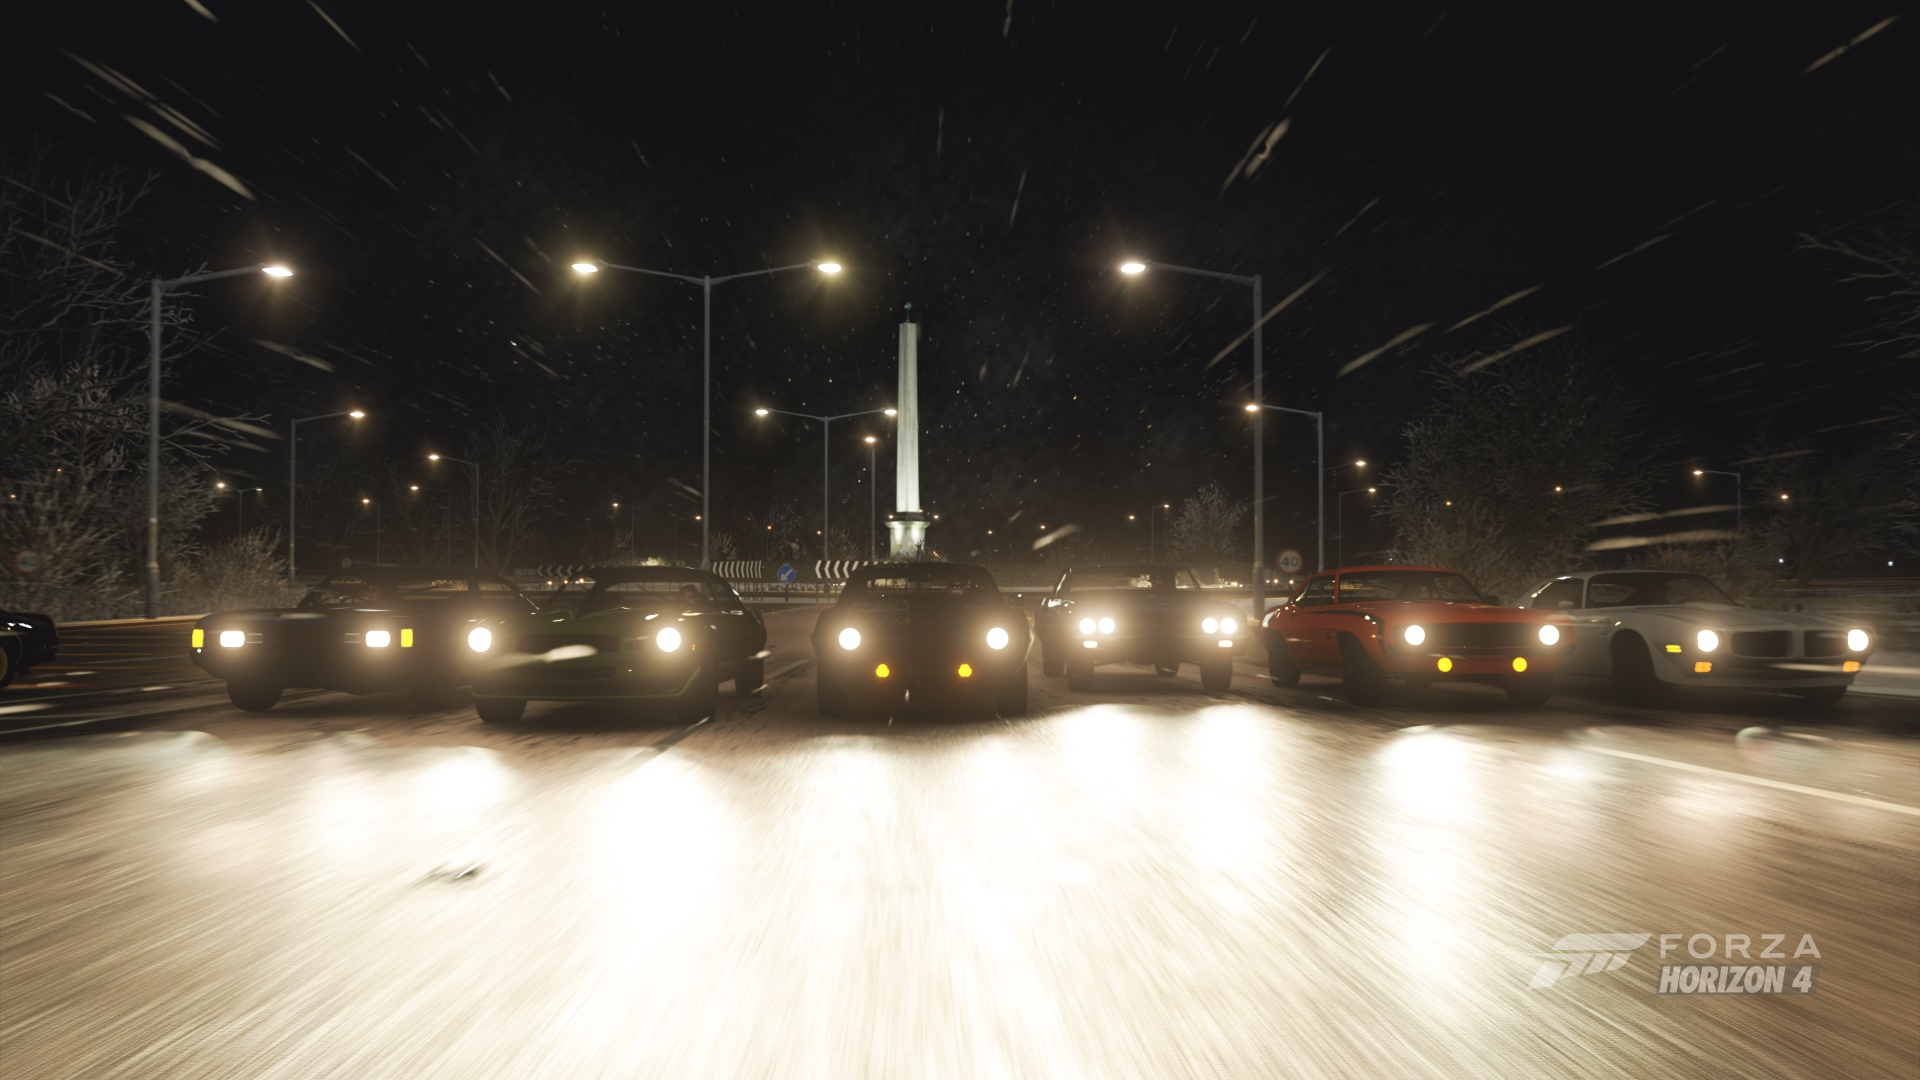 Поездка за пирожками - Forza Horizon 4